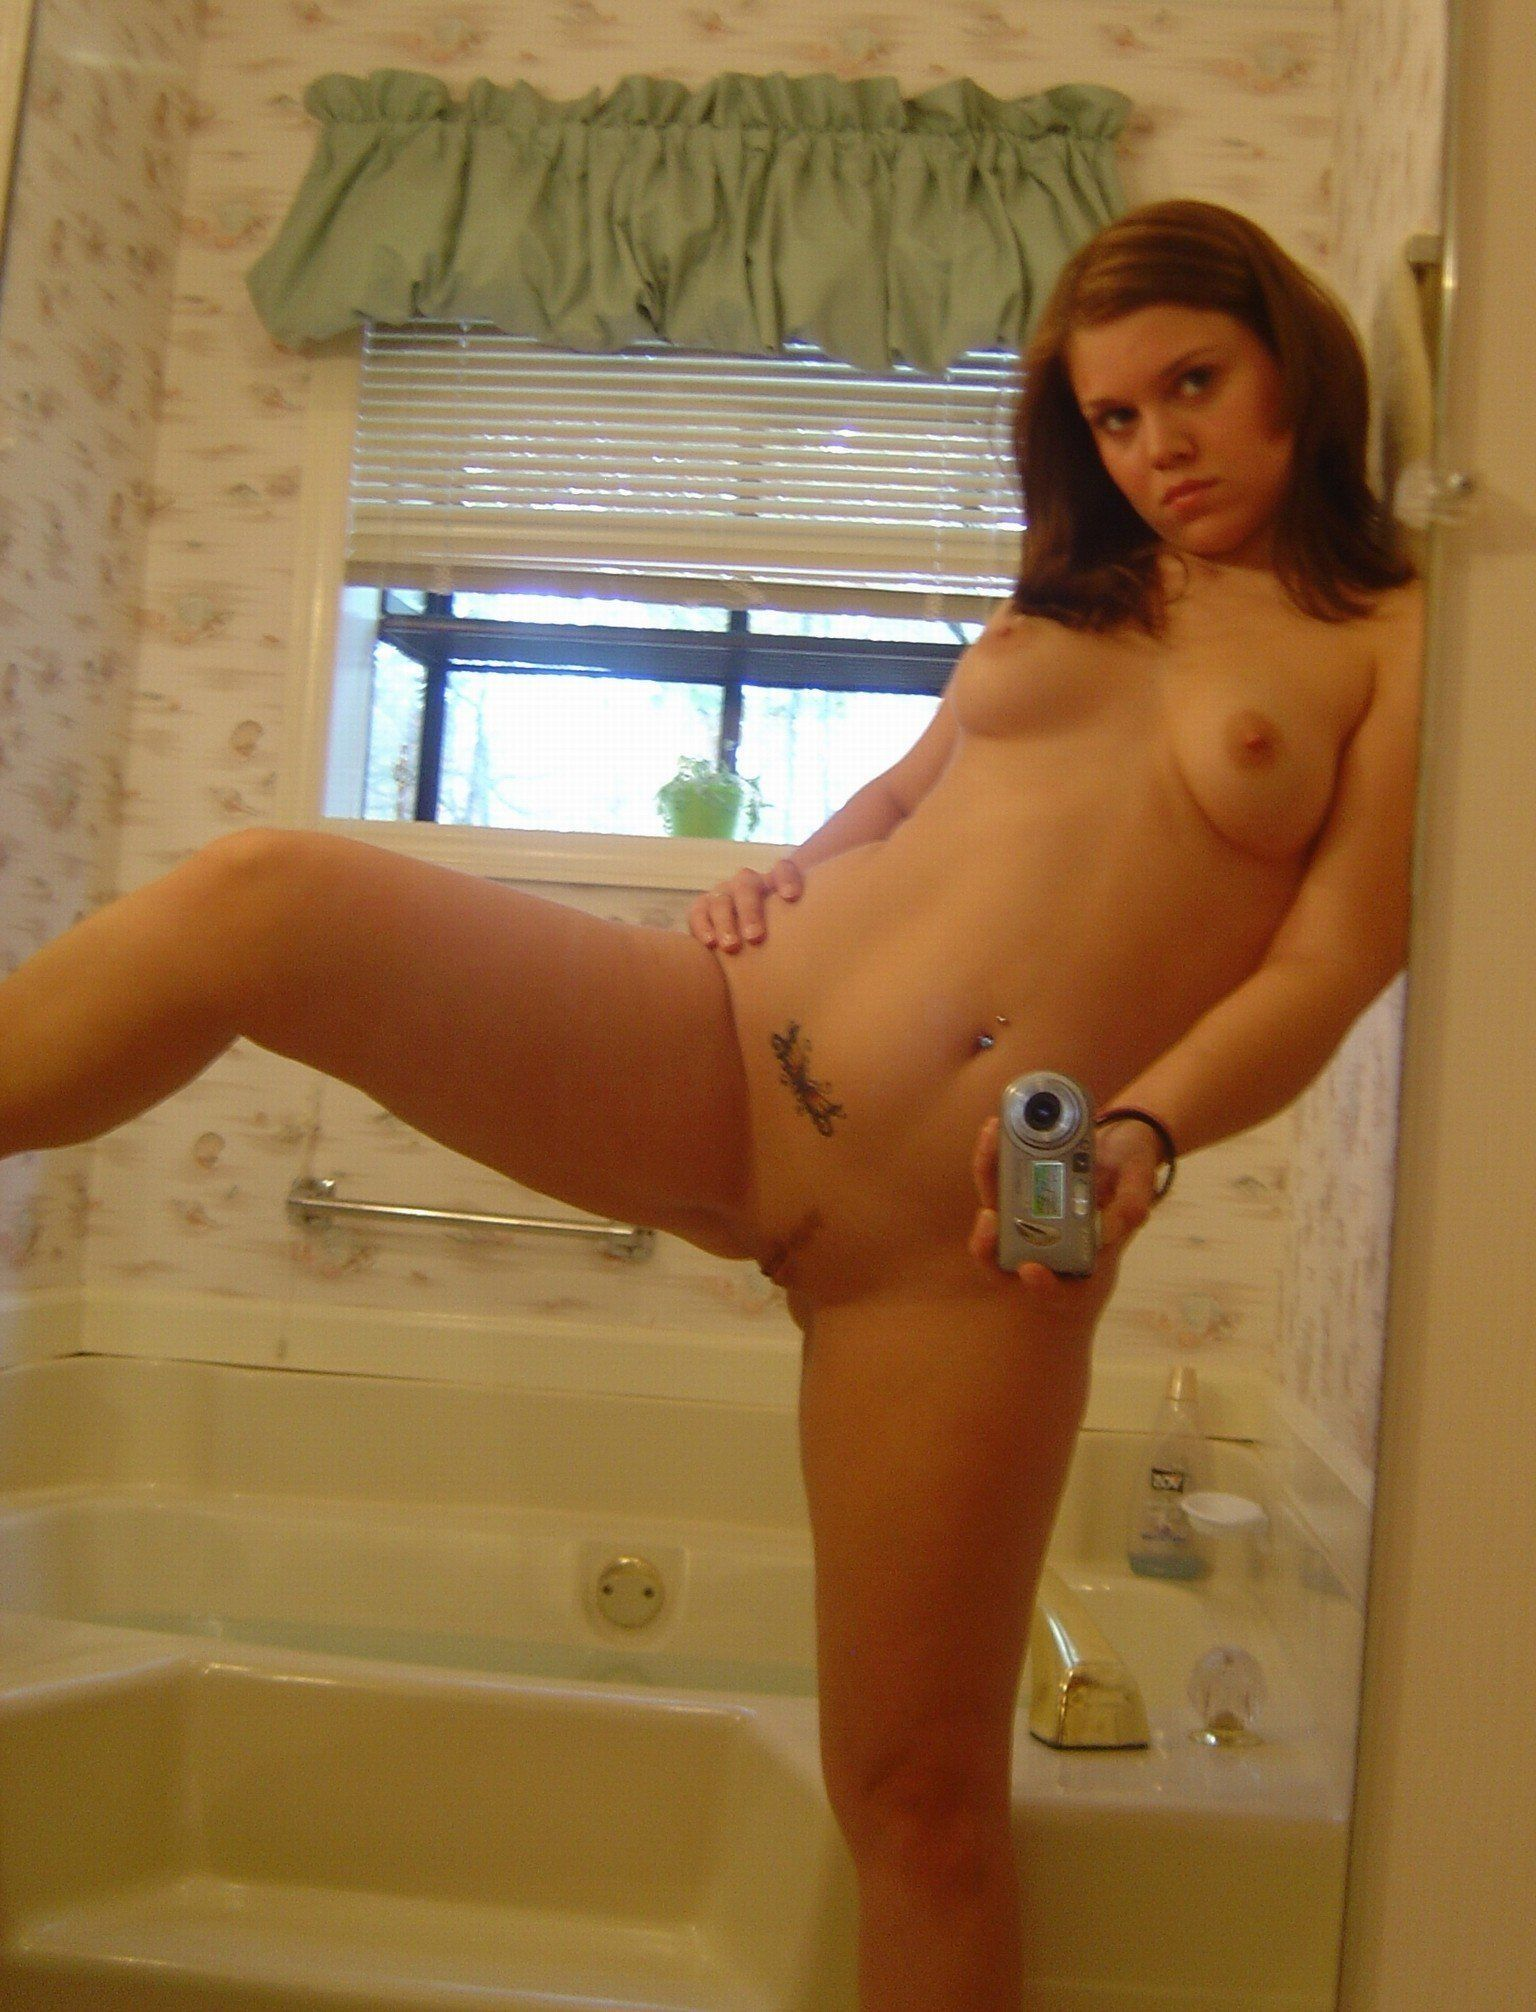 Self shot nude girls together